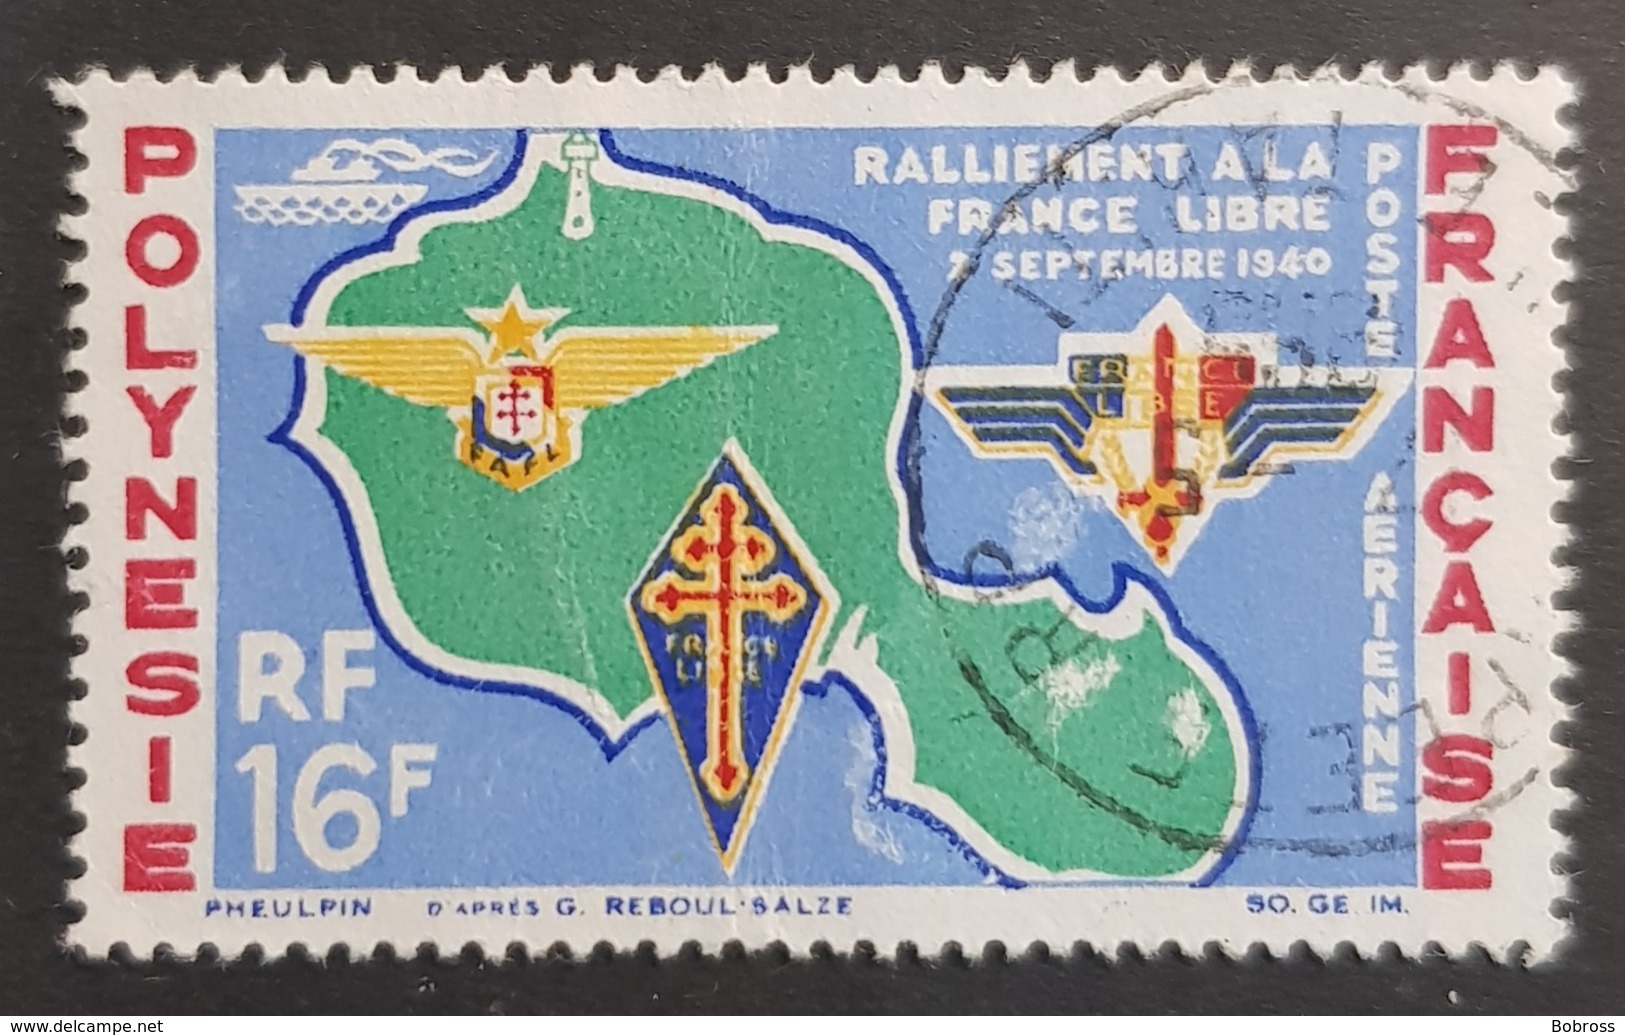 1964 Airmail, Polynesie, France, Republique Française, *,**, Or Used - Gebraucht